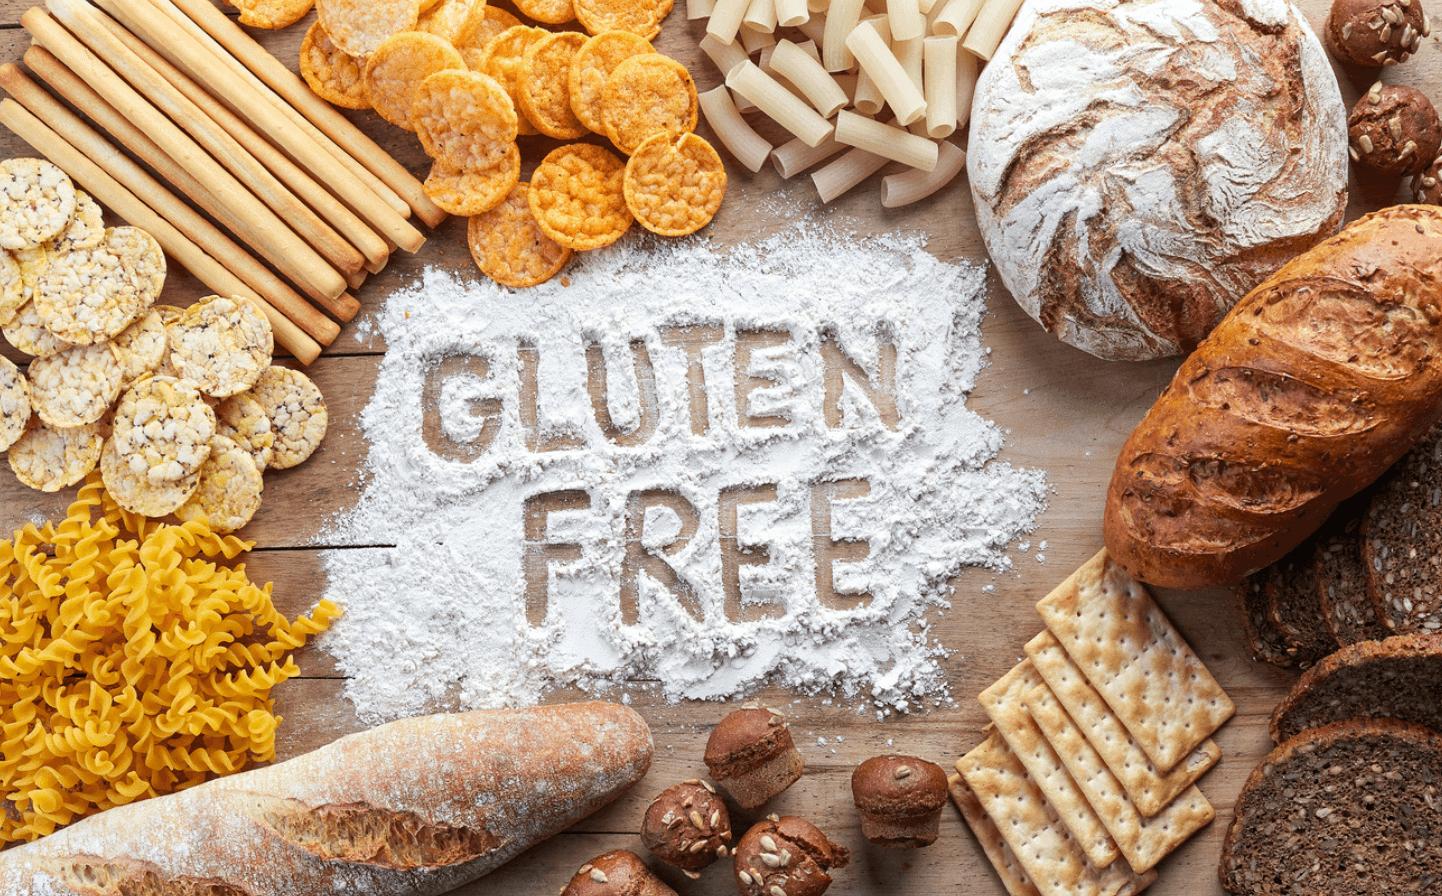 Junk foods - Gluten-Free